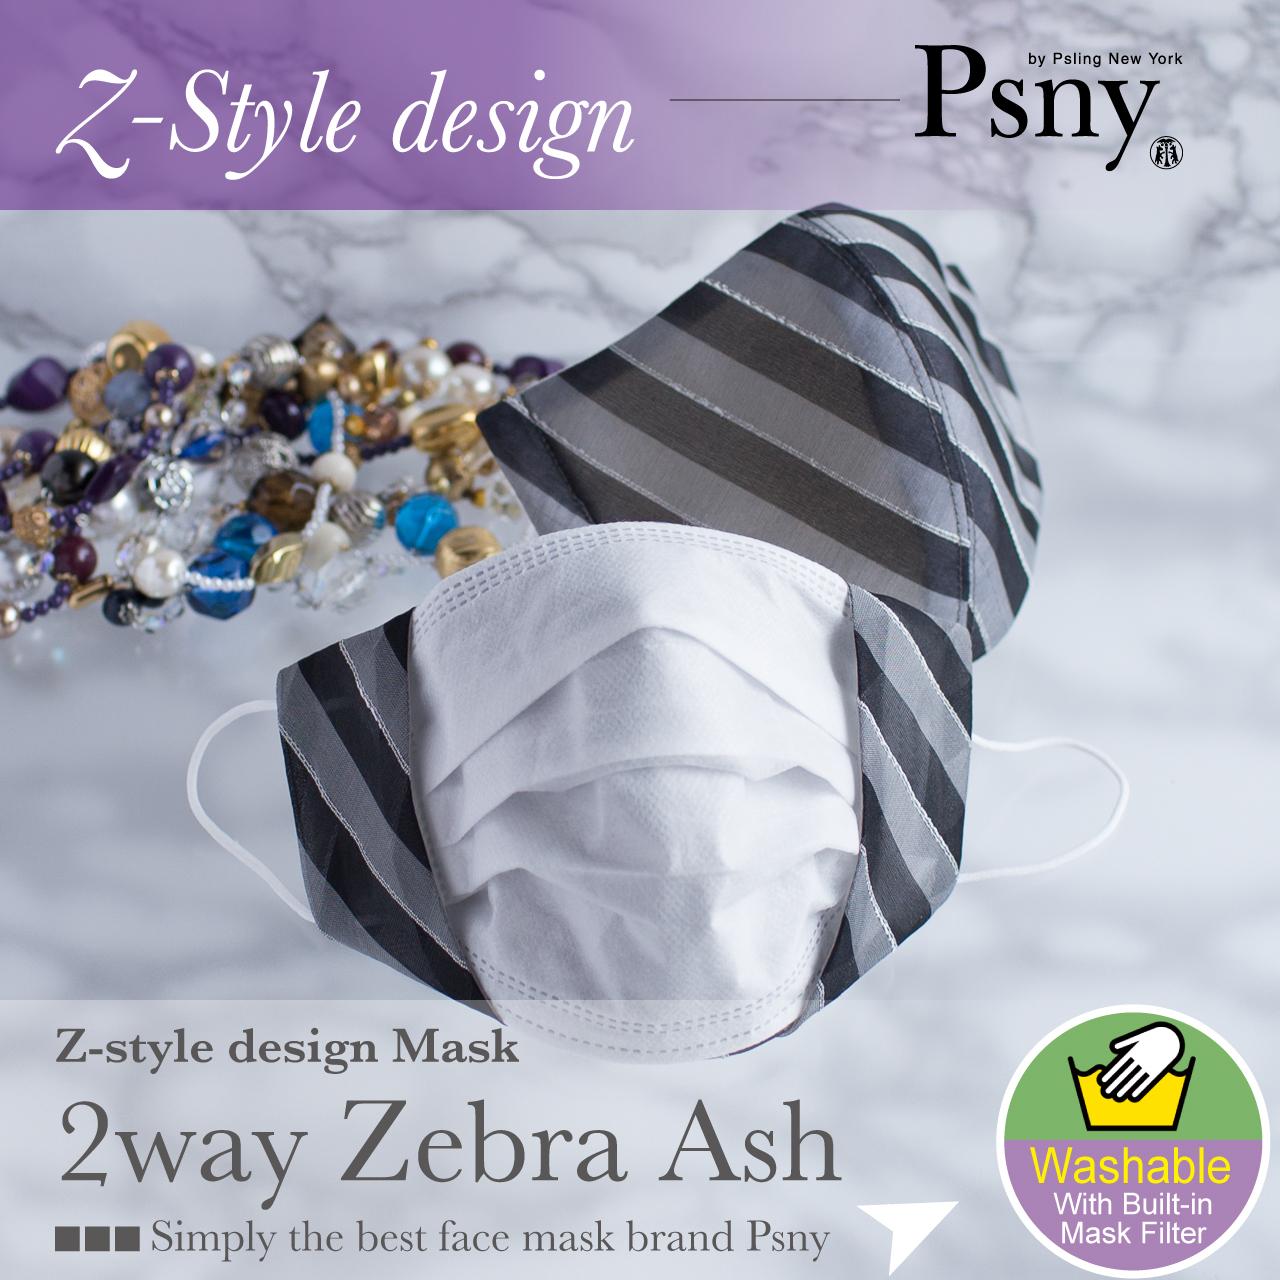 Psny 2way ゼブラ・アッシュ 花粉 黄砂 不織布フィルター 立体 大人 軽量 涼しい 夏 マスク Z03